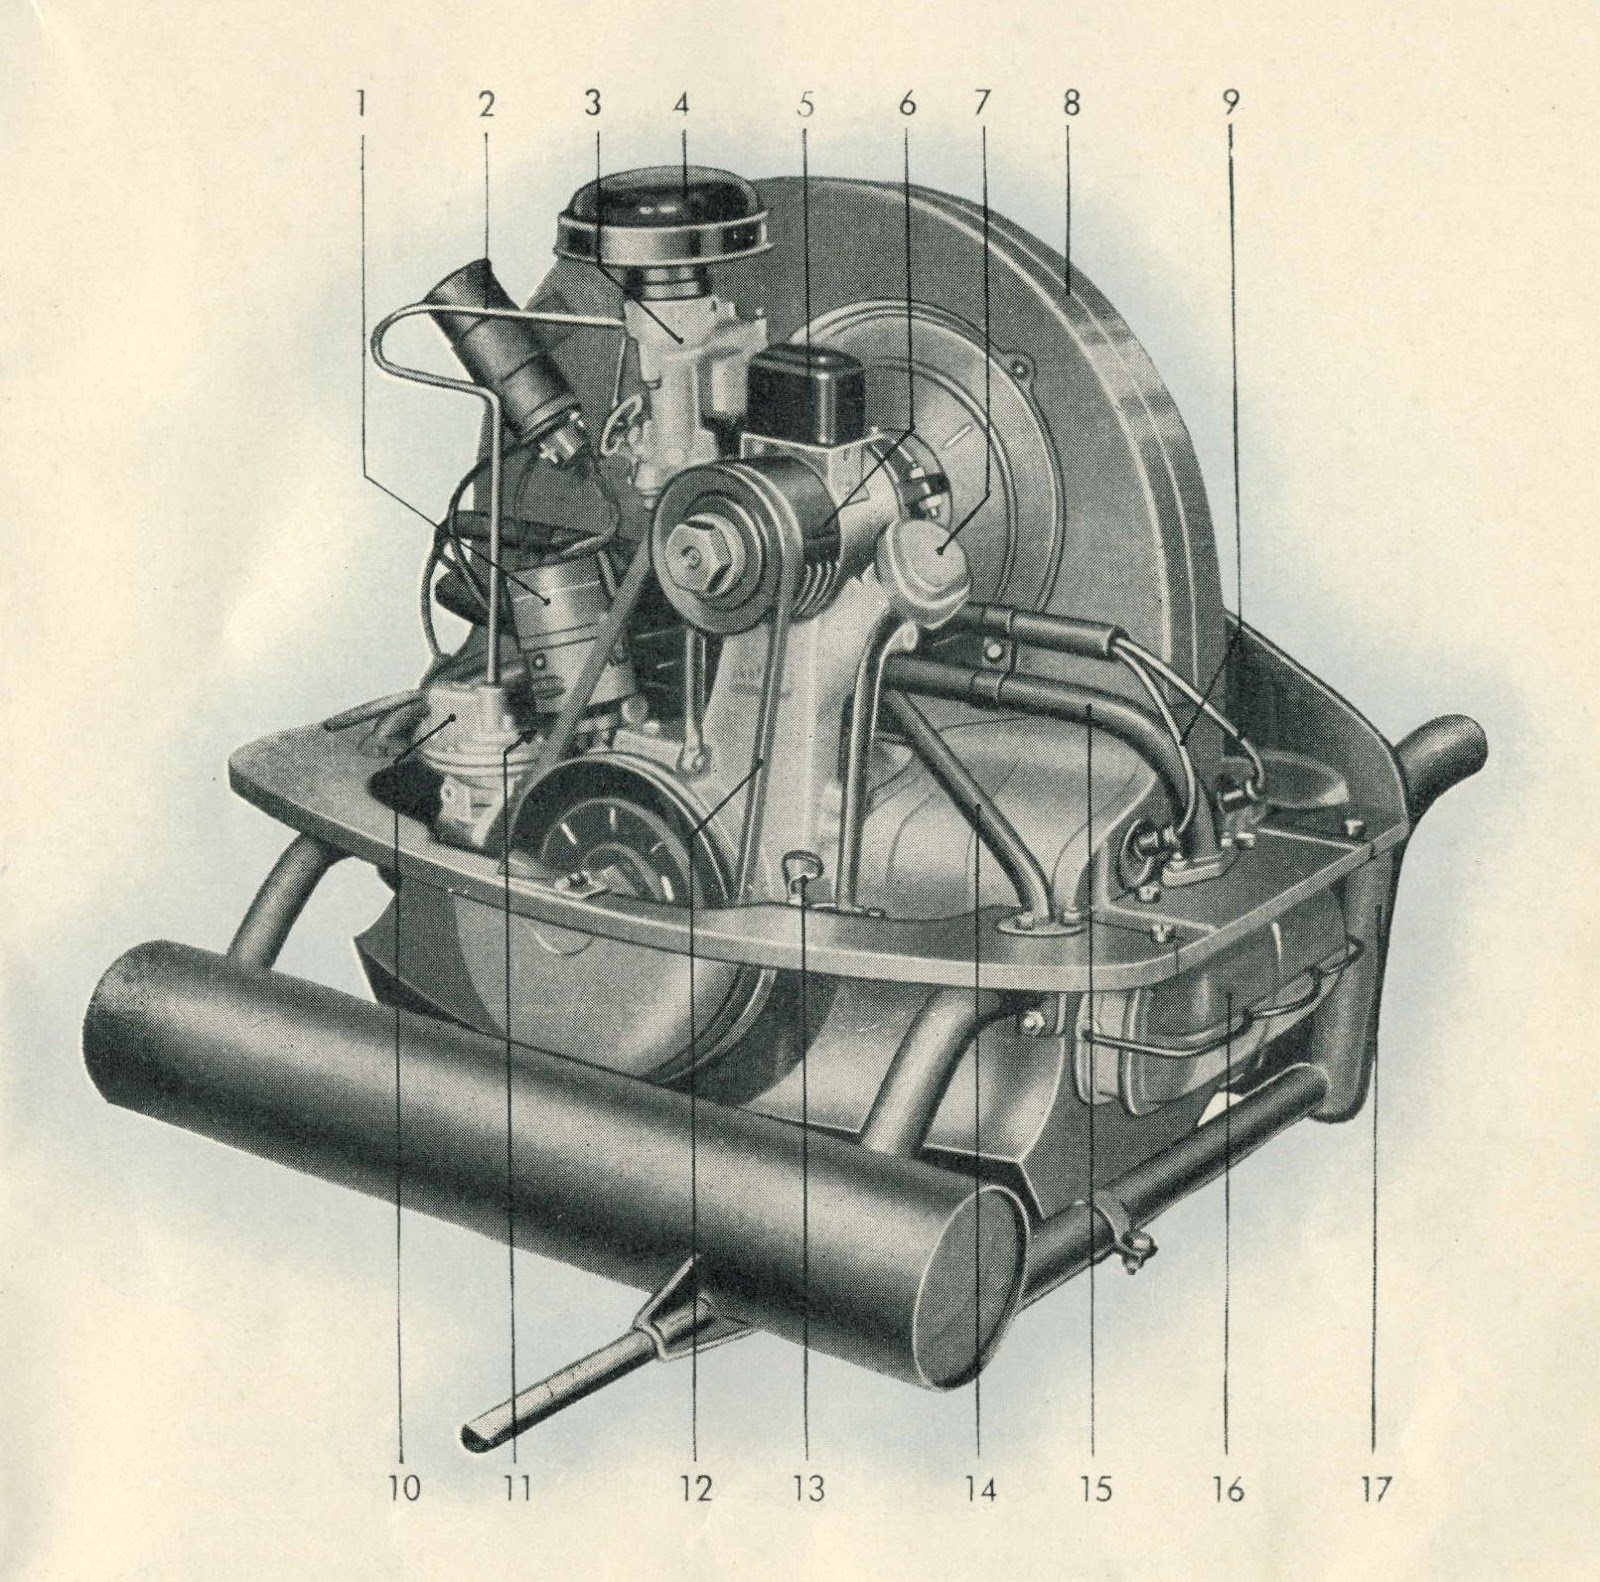 medium resolution of heinkel scooter project the tatra versus volkswagen lawsuit tatra 97 engine diagram